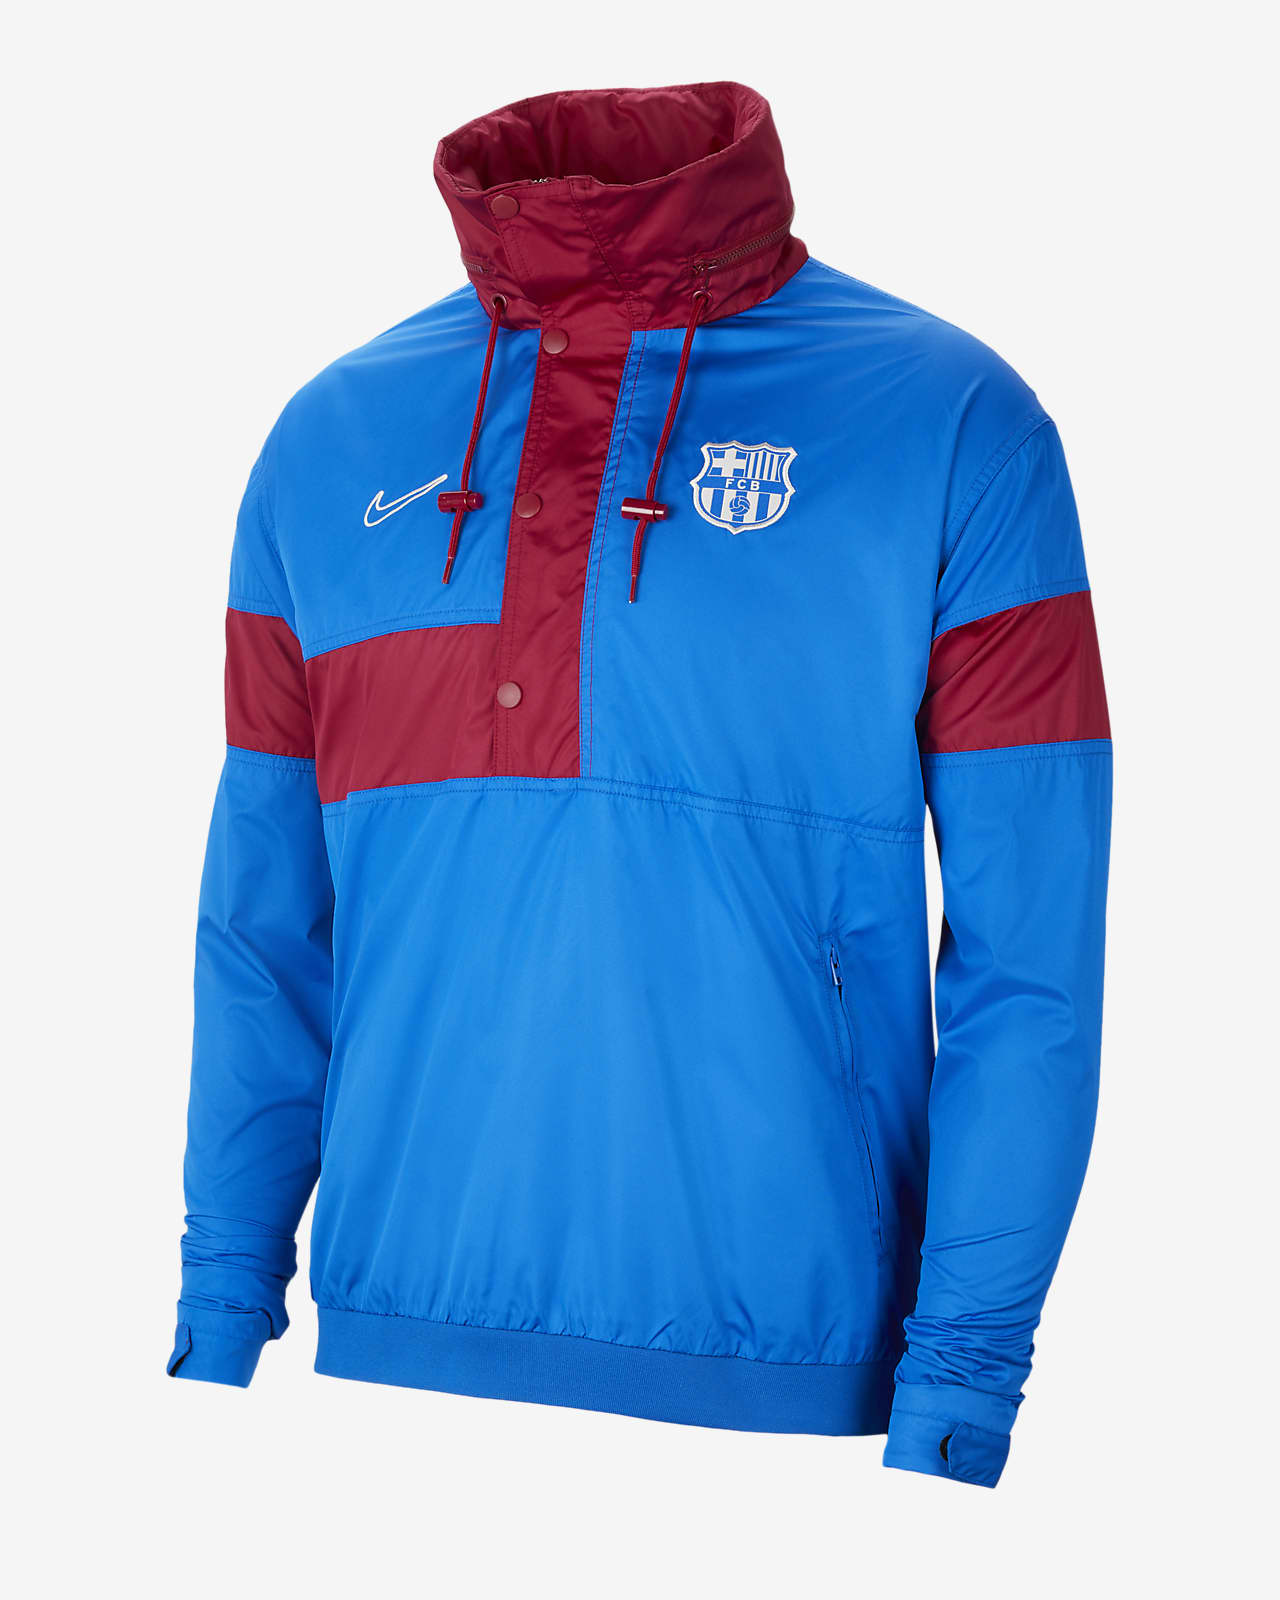 F.C. Barcelona Men's Football Anorak Jacket